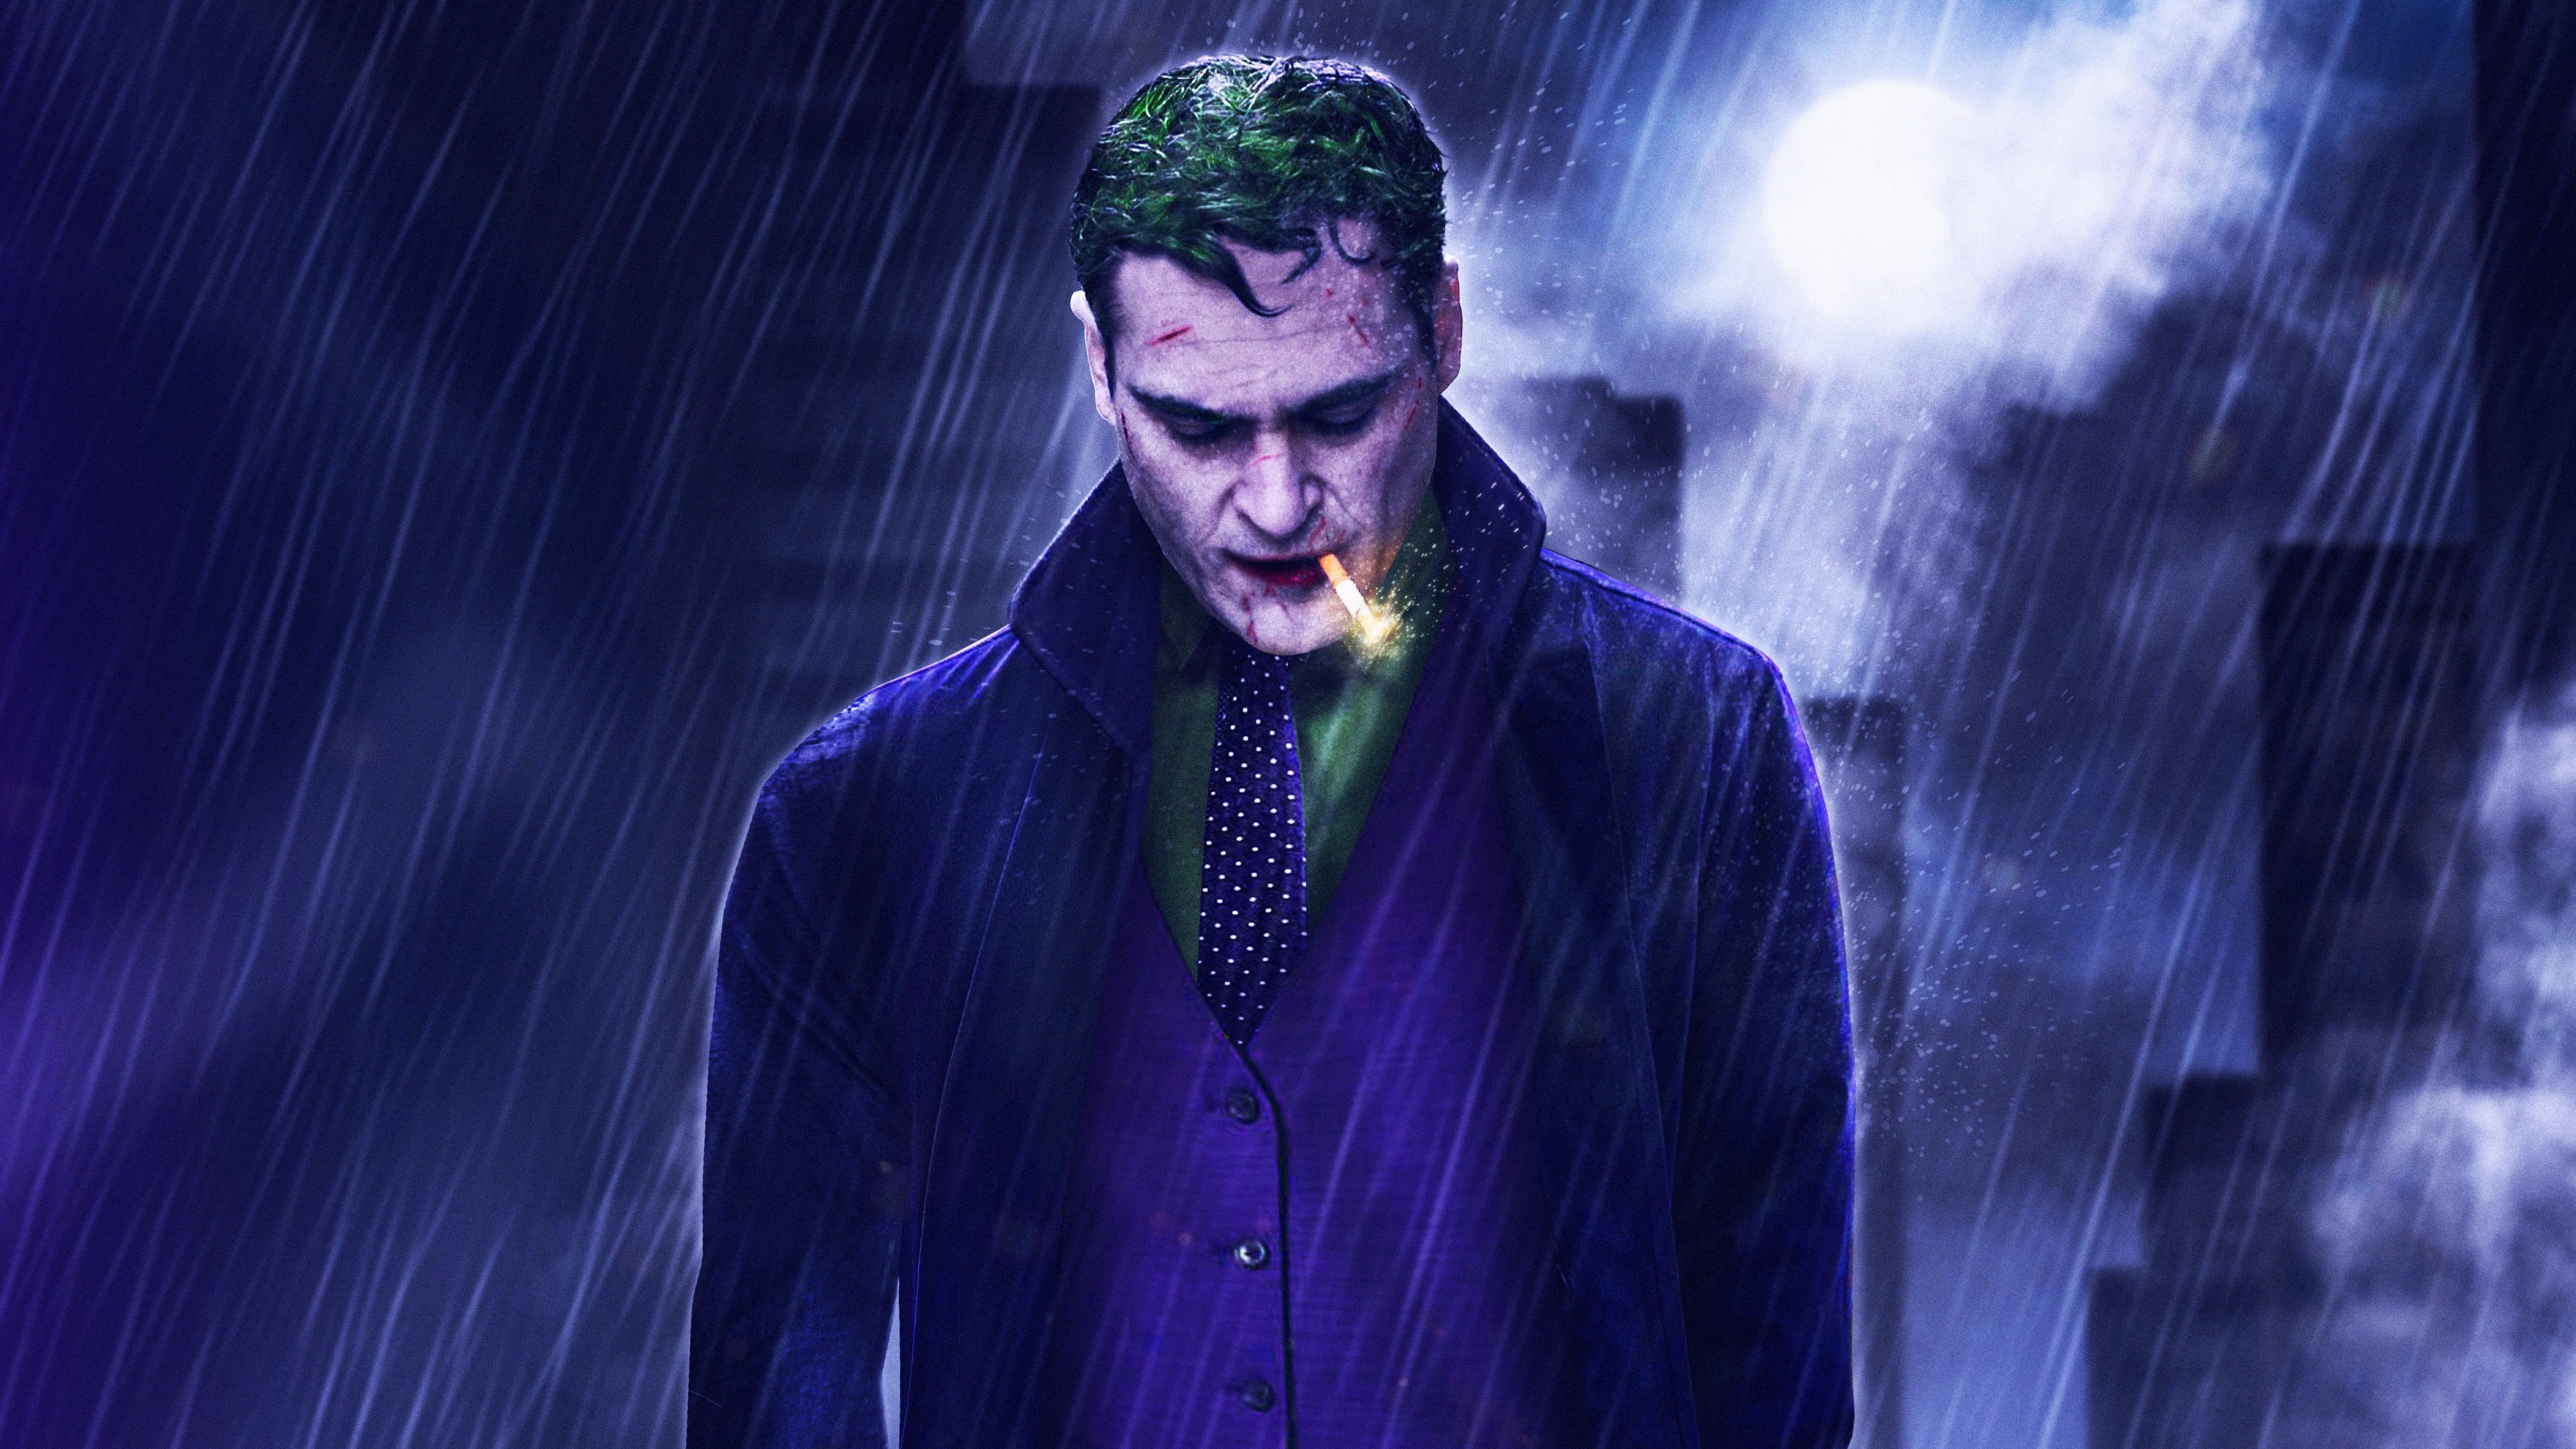 Joaquin Phoenix Joker 2019 Movie 5k Hd Movies 4k